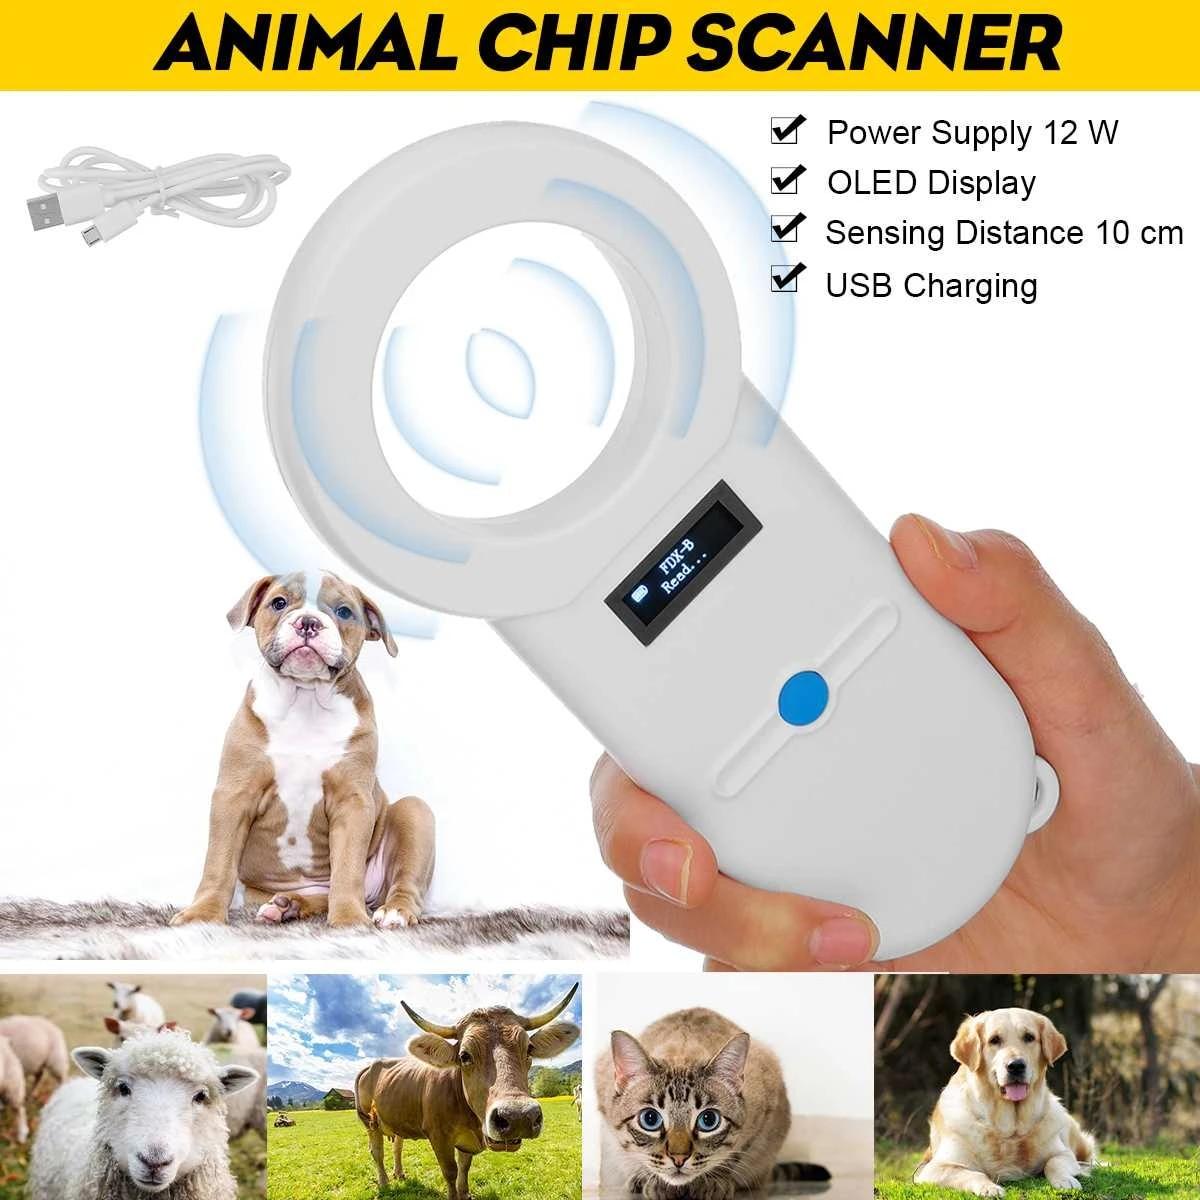 134.2kHz Animal Handheld RFID Chip Reader Microchip Portable Pet ...